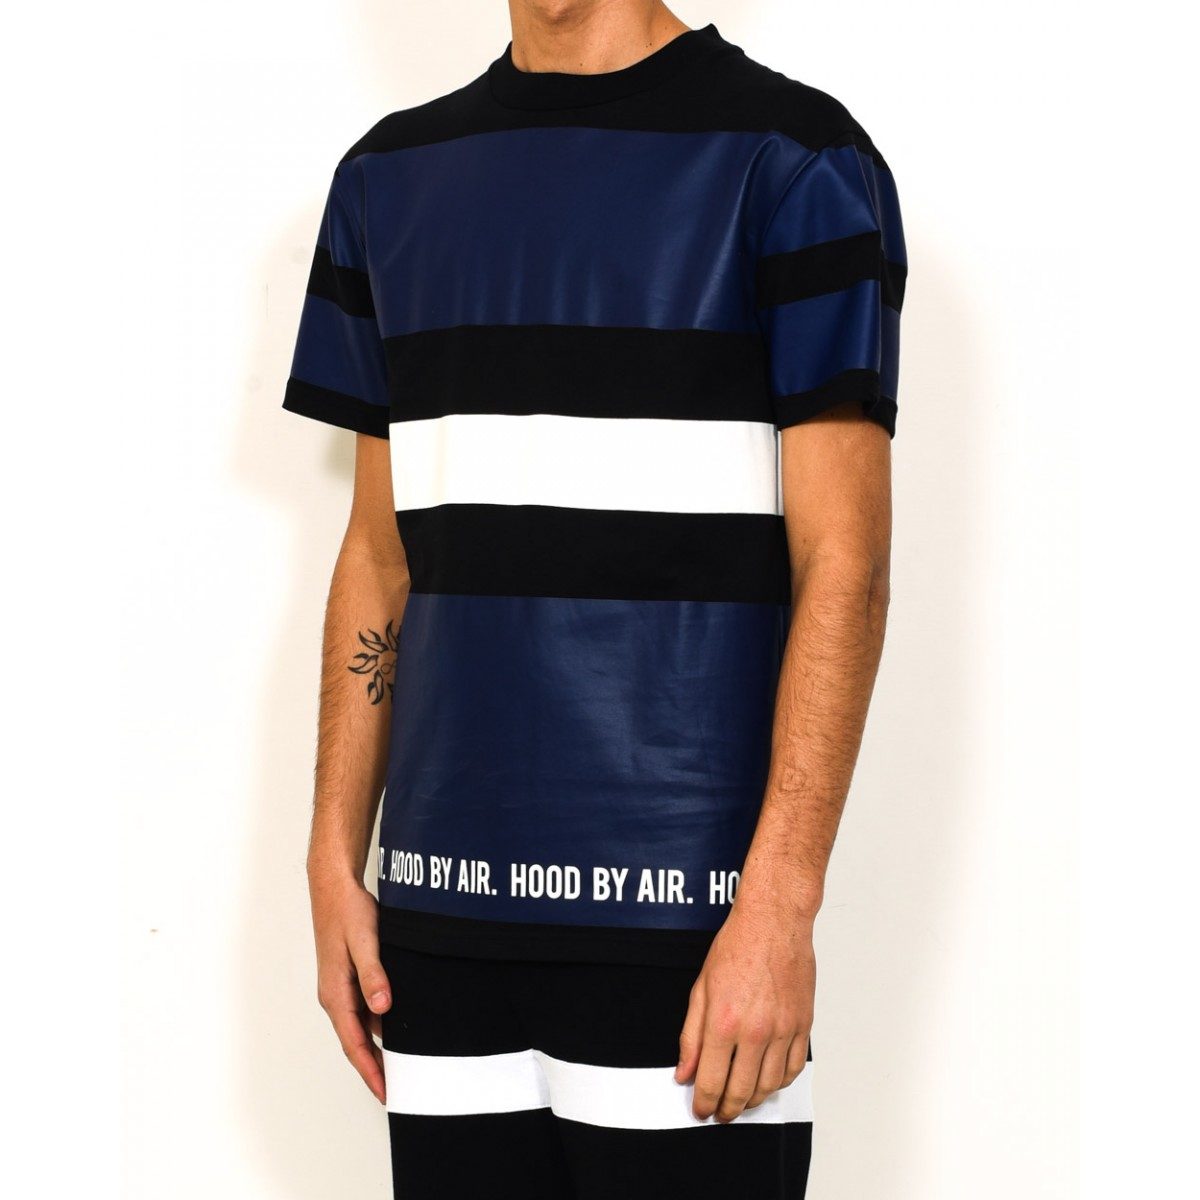 https://cdnb.lystit.com/photos/3f4a-2016/01/08/hood-by-air-t-shirt-multistripes-product-0-219474374-normal.jpeg Hood